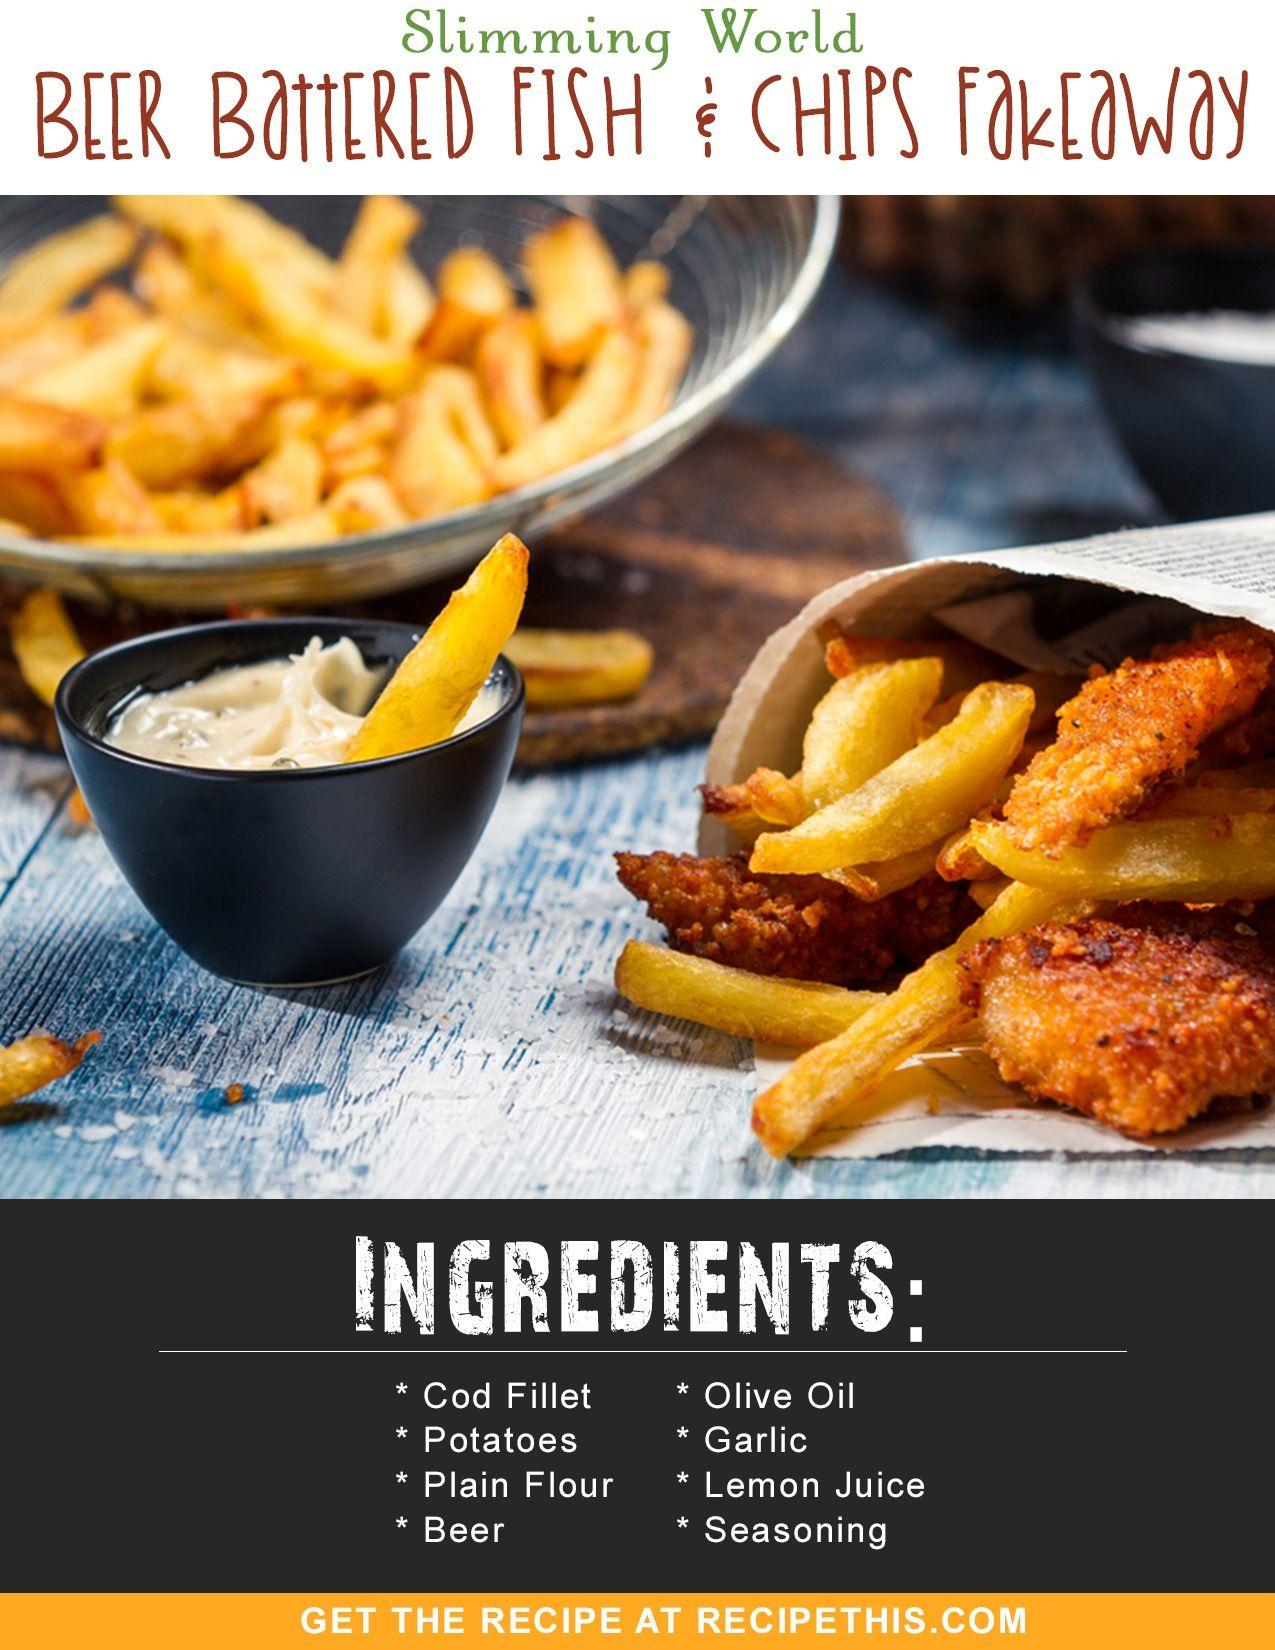 Recipe This Slimming World Beer Battered Fish Chips Fakeaway Recipe Fakeaway Recipes Beer Battered Fish Recipes